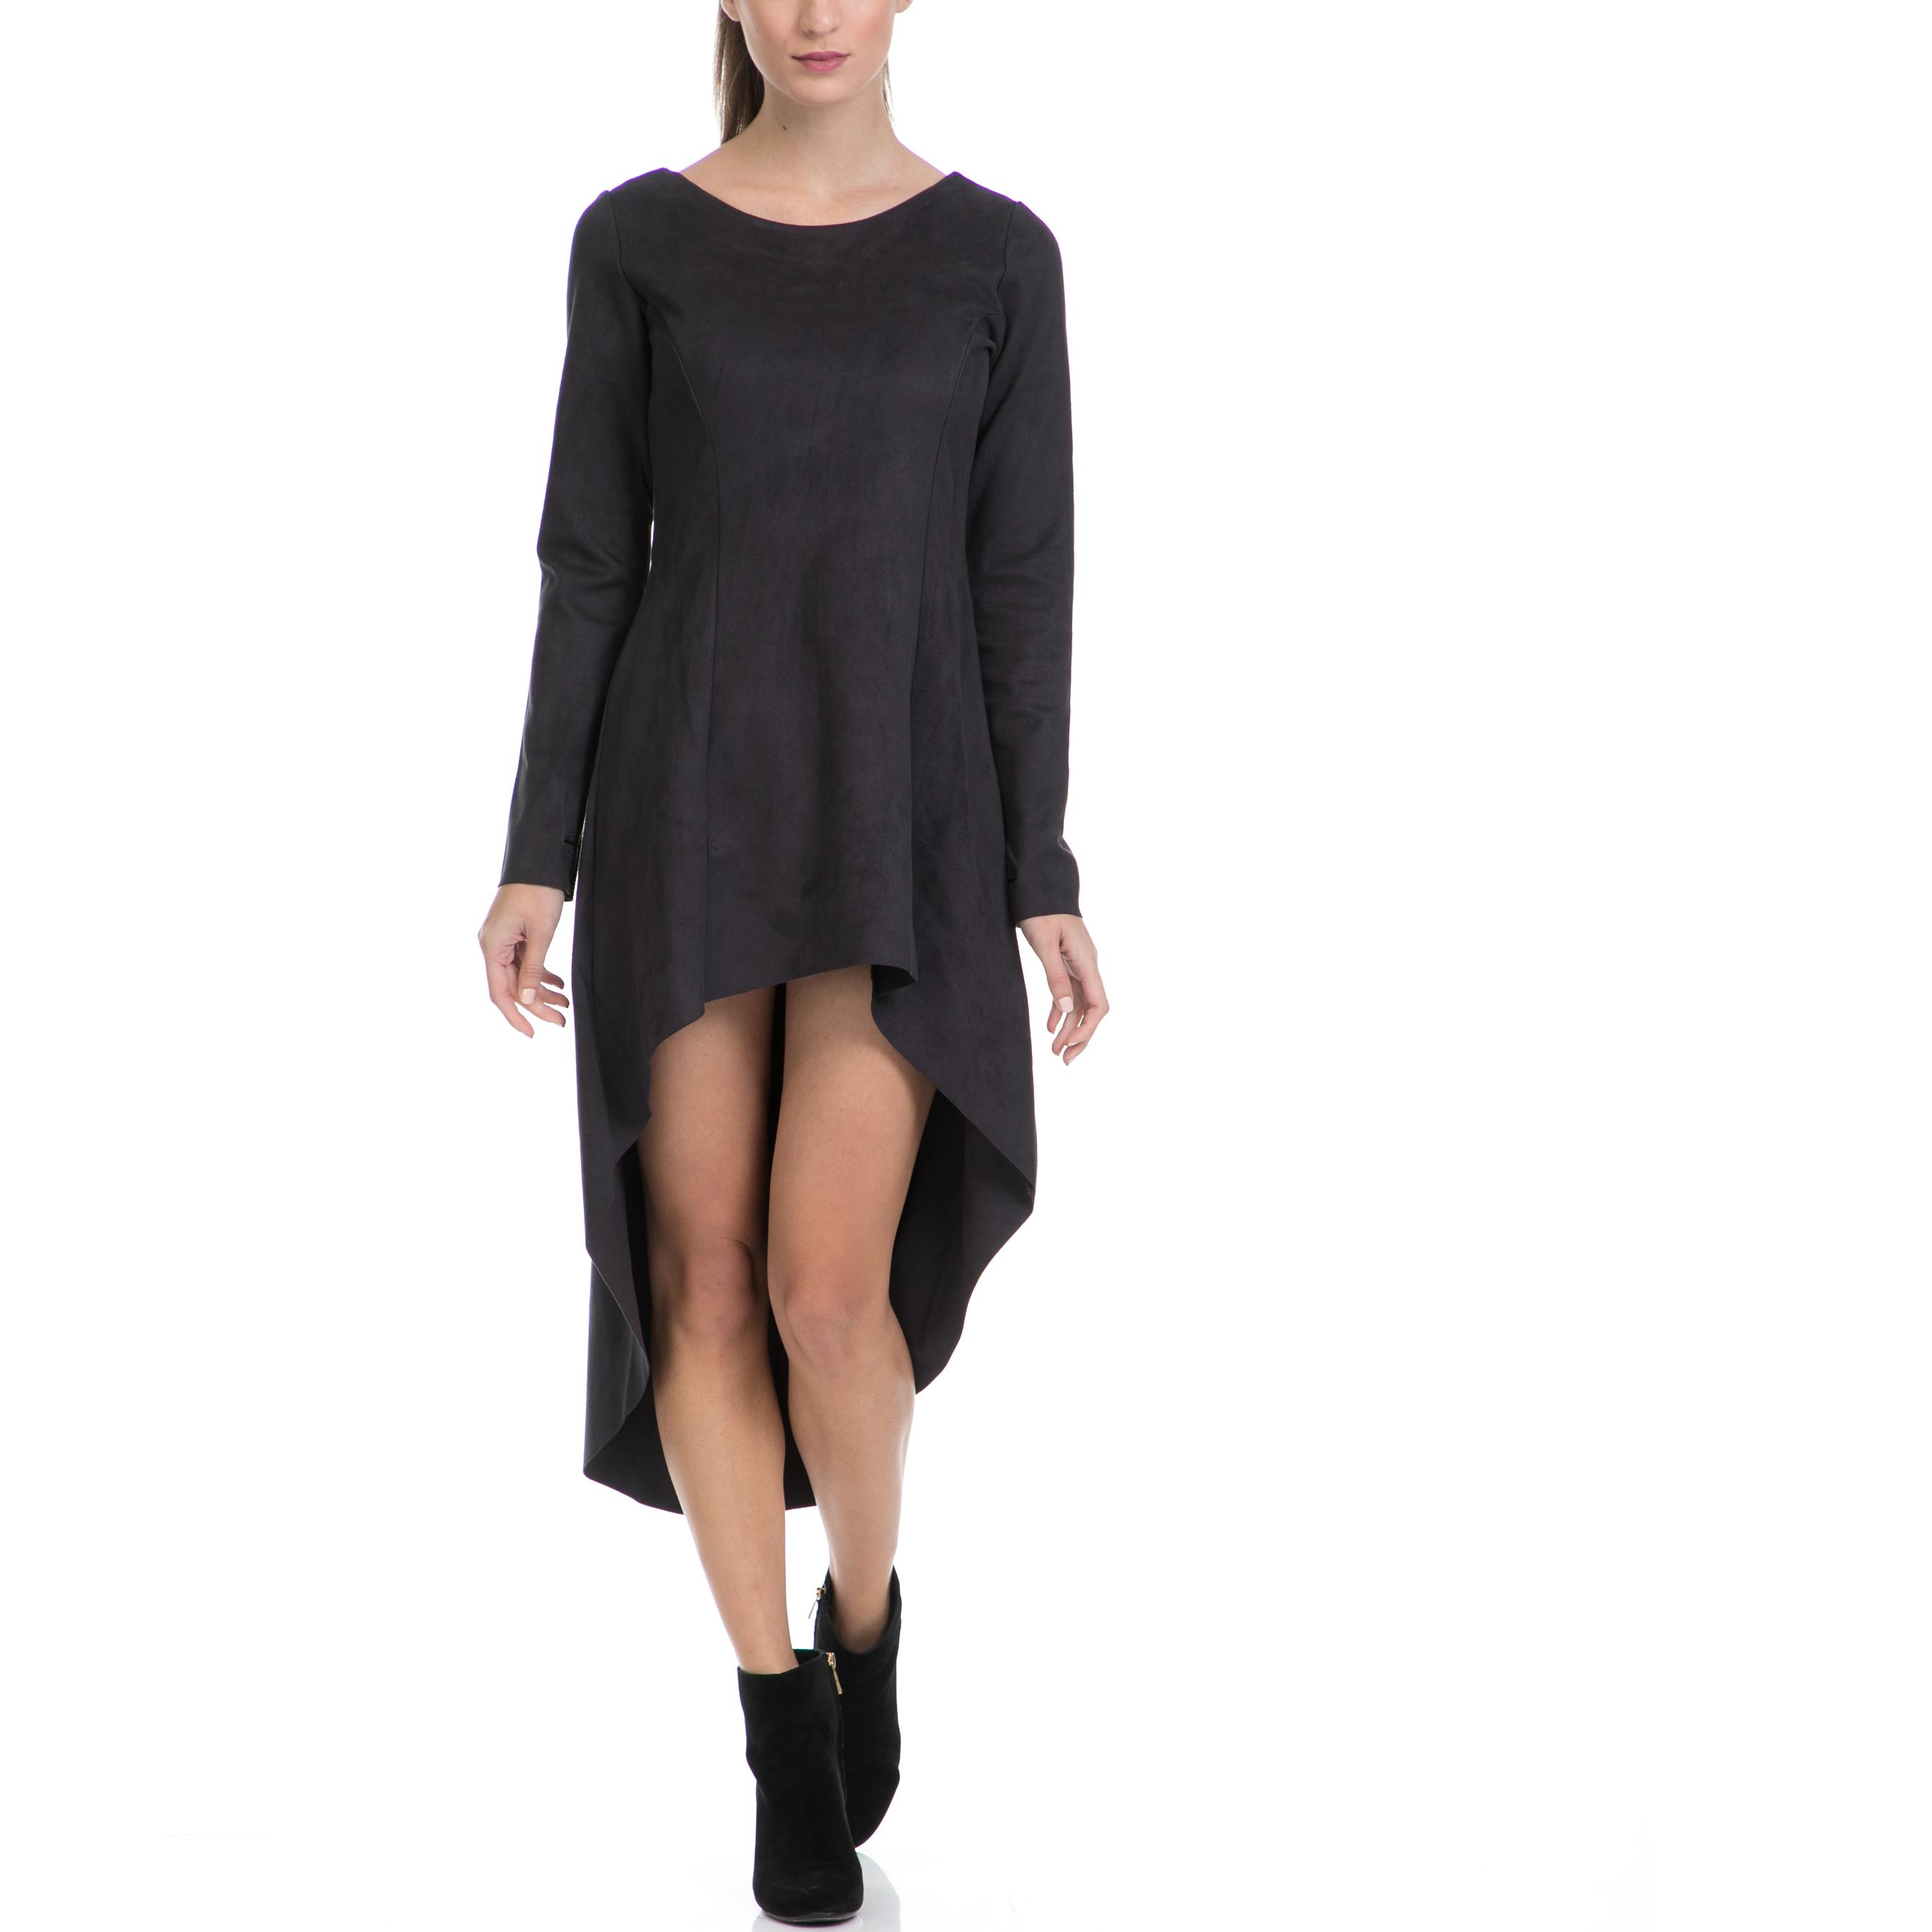 LA DOLLS - Γυναικείο φόρεμα LA DOLLS μαύρο γυναικεία ρούχα φορέματα μίνι